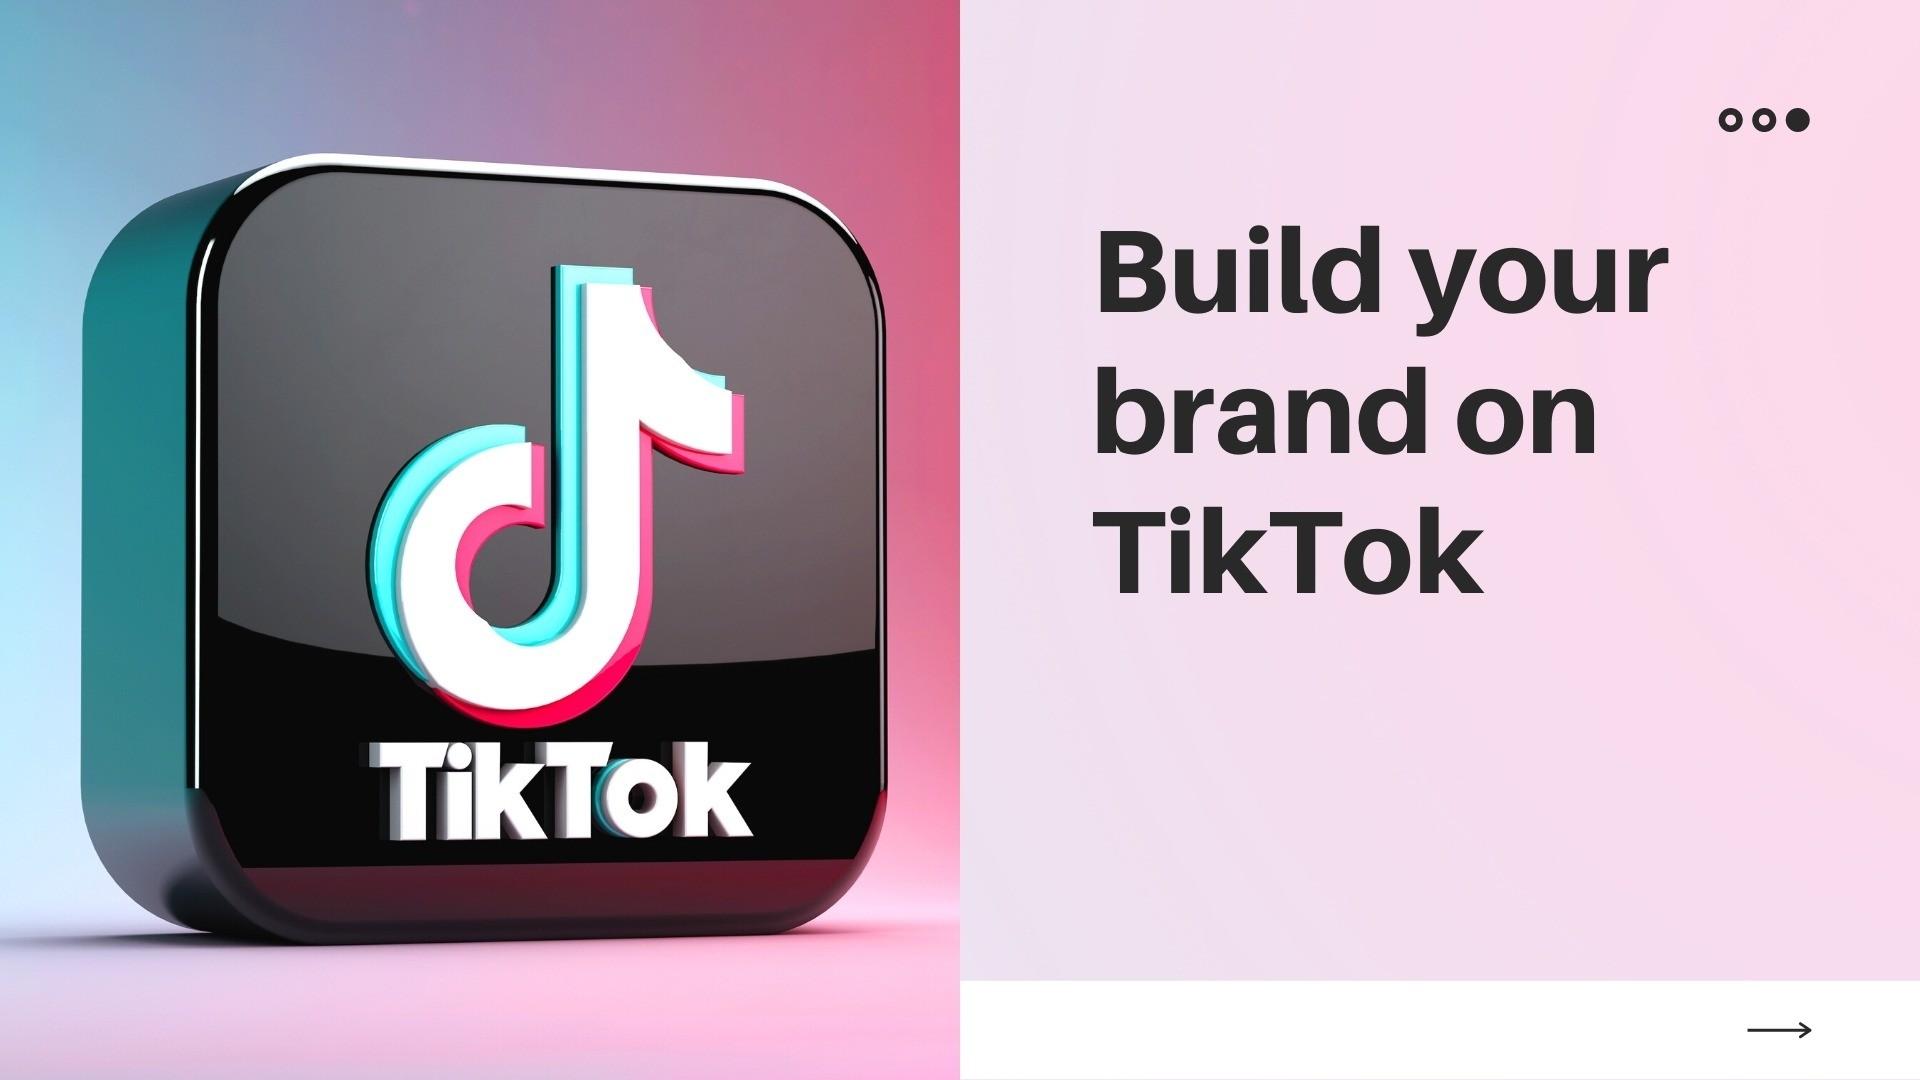 AppSumo Deal for Build Your Brand on TikTok